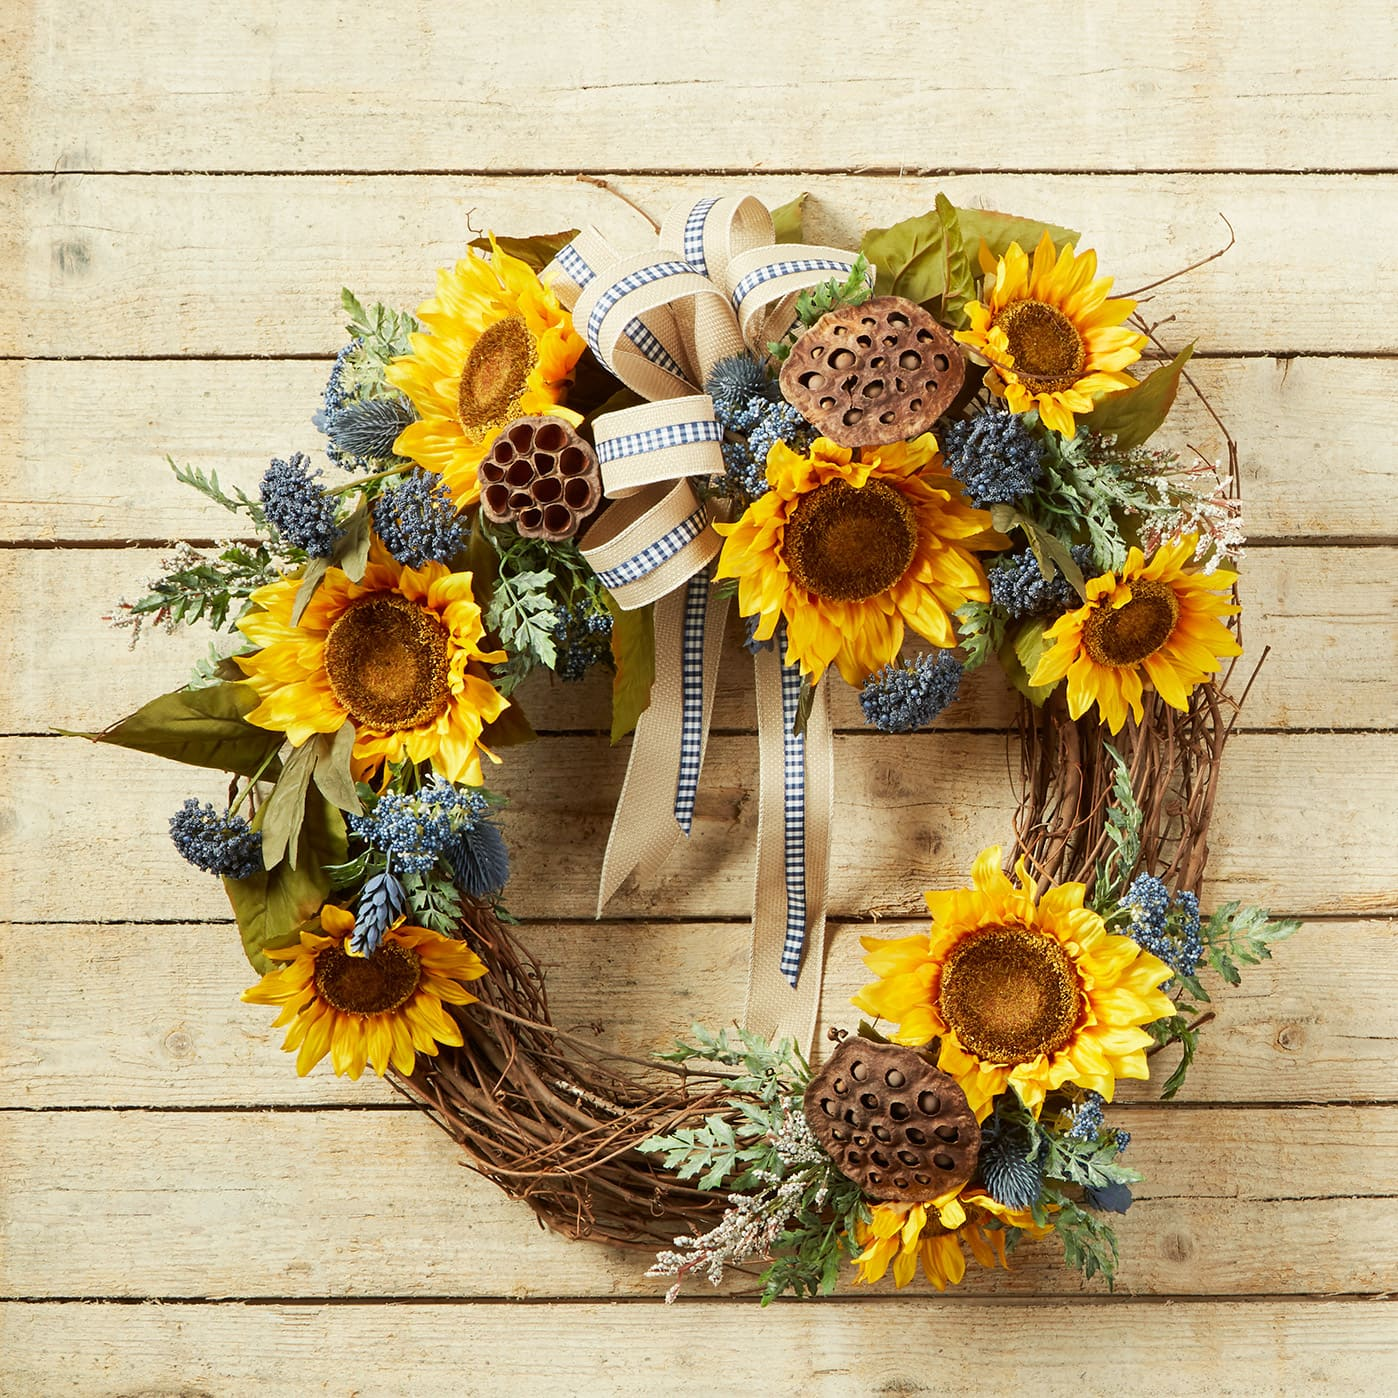 Summer To Fall Sunflower Transitional Wreath